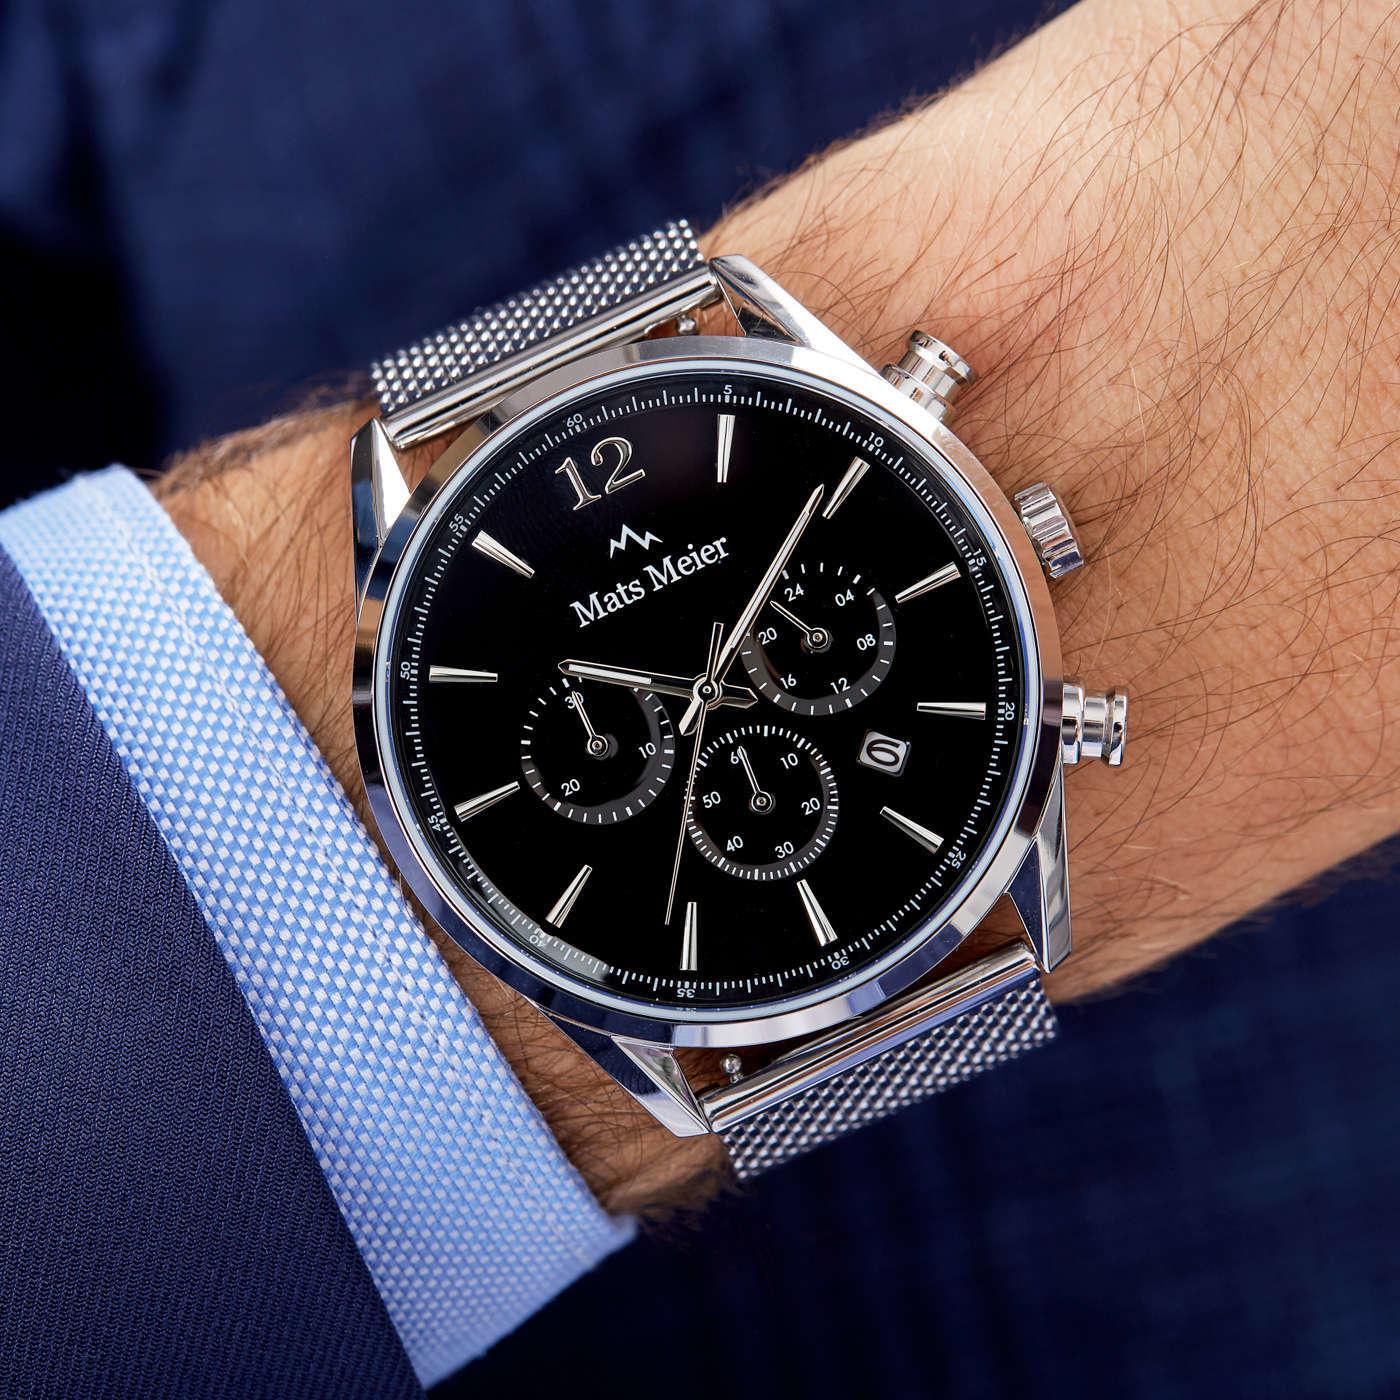 Mats Meier Grand Cornier chronograph watch black/silver mesh